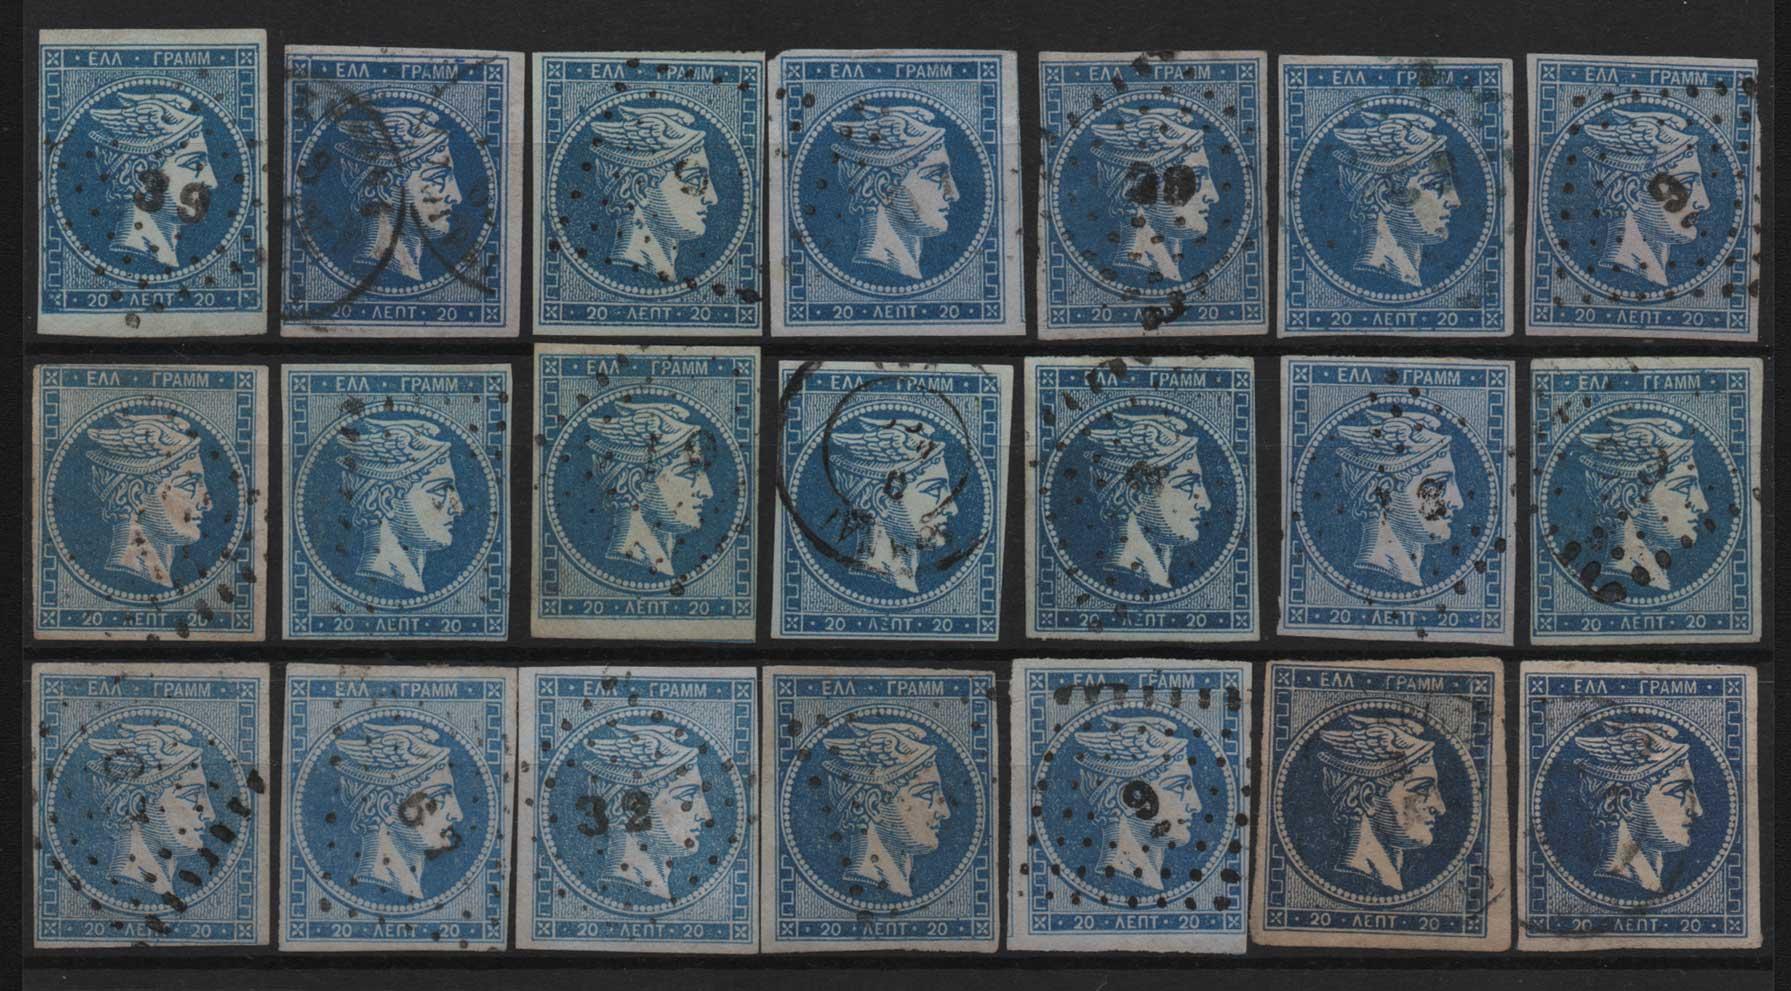 Lot 25 - -  LARGE HERMES HEAD large hermes head -  Athens Auctions Public Auction 92 General Stamp Sale